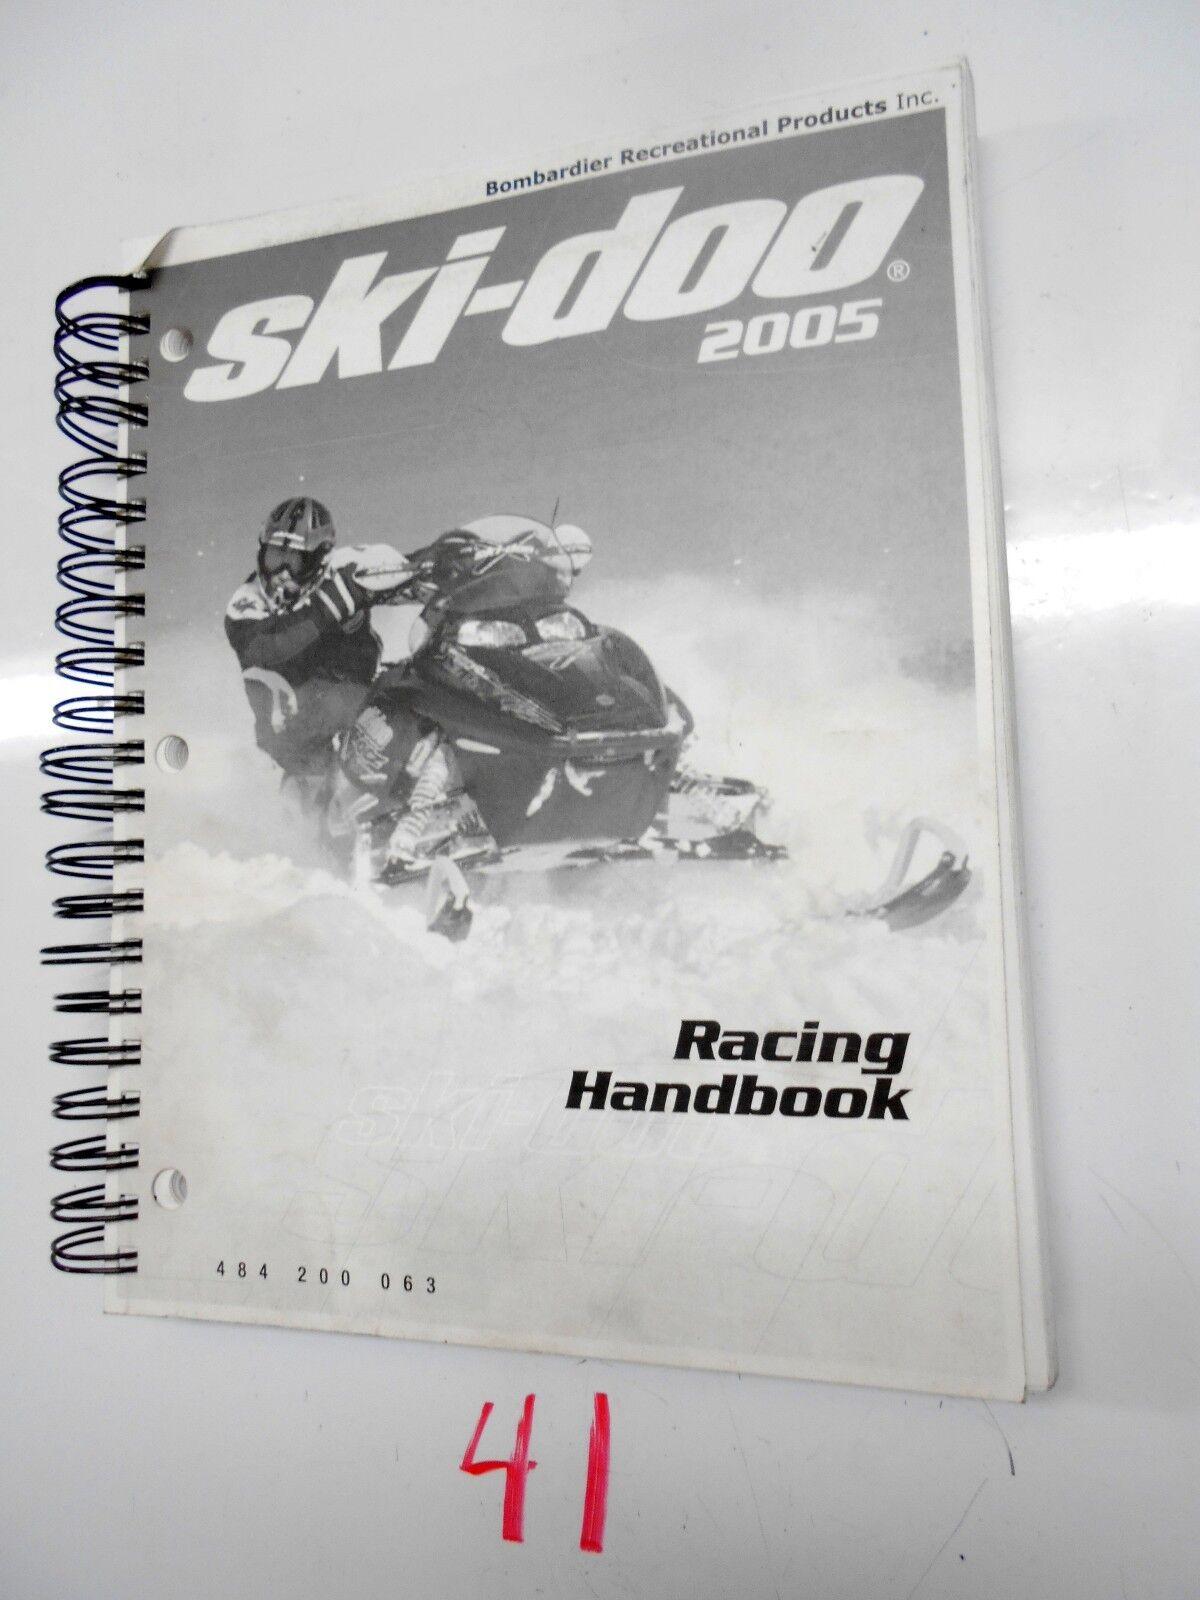 2005  SKI-DOO SNOWMOBILE  RACING HANDBOOK SERVICE  MANUAL P N 484 200 063  (854))  save up to 70%